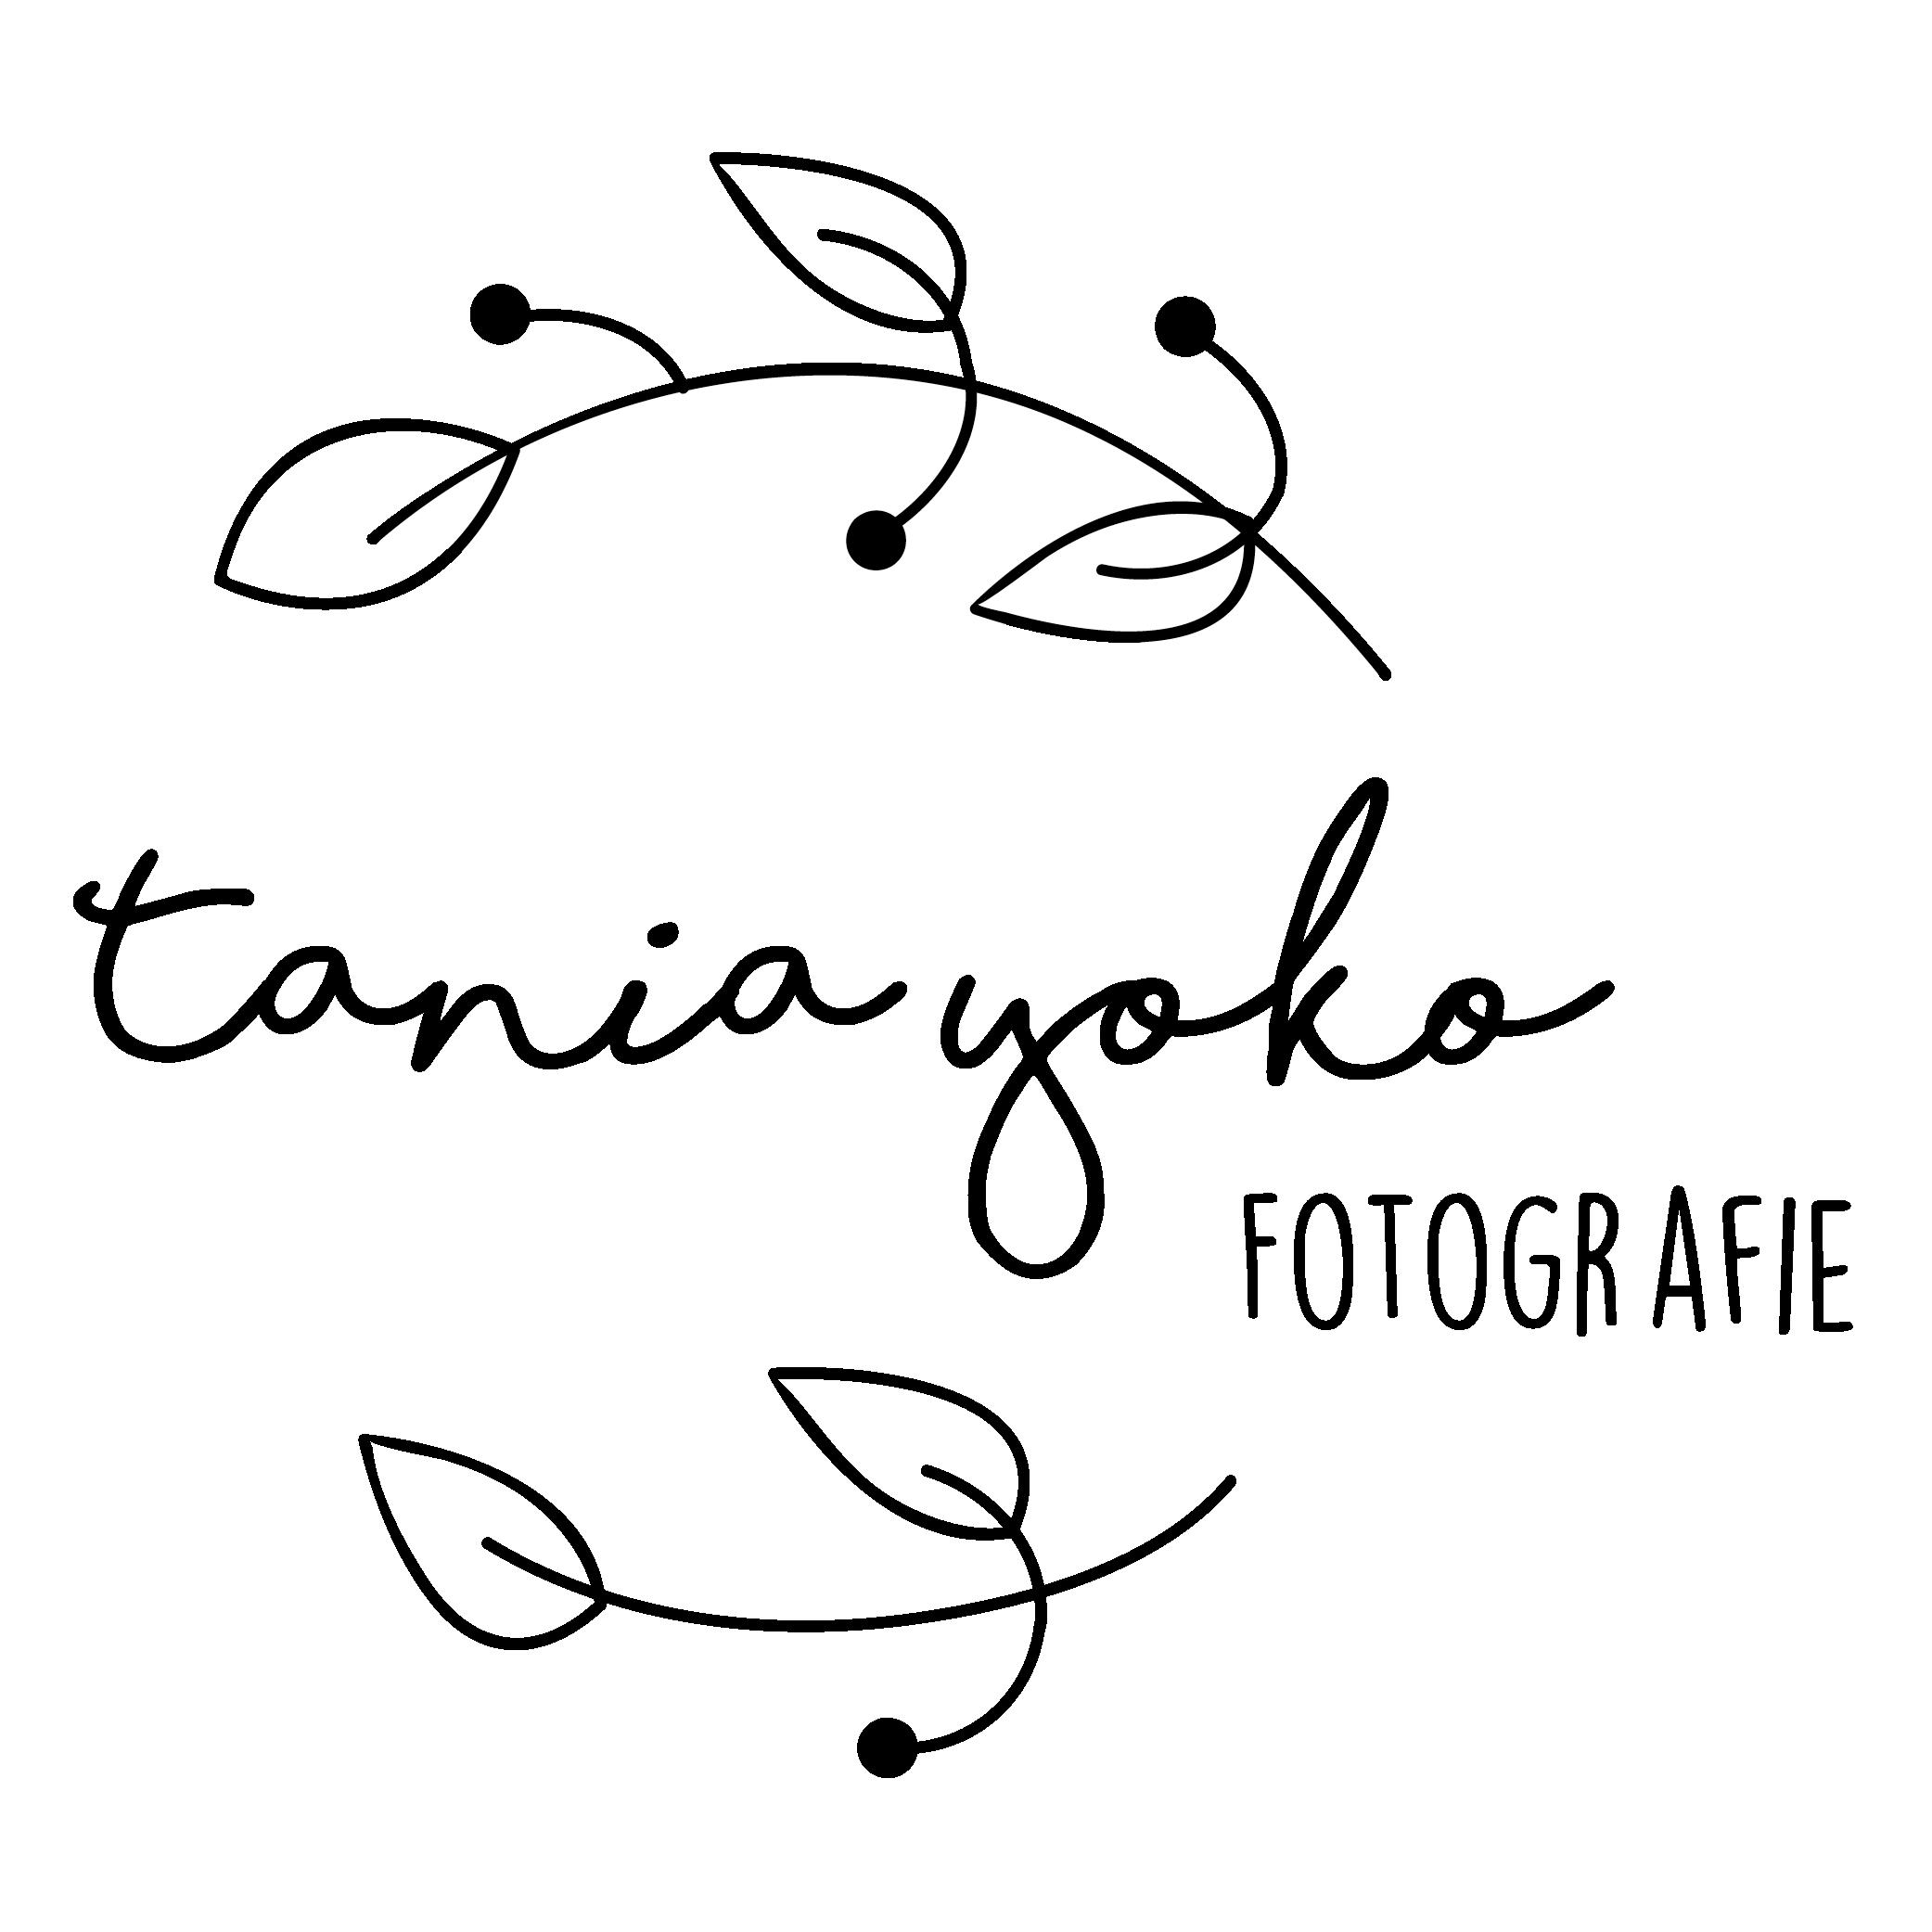 Tania Yoko